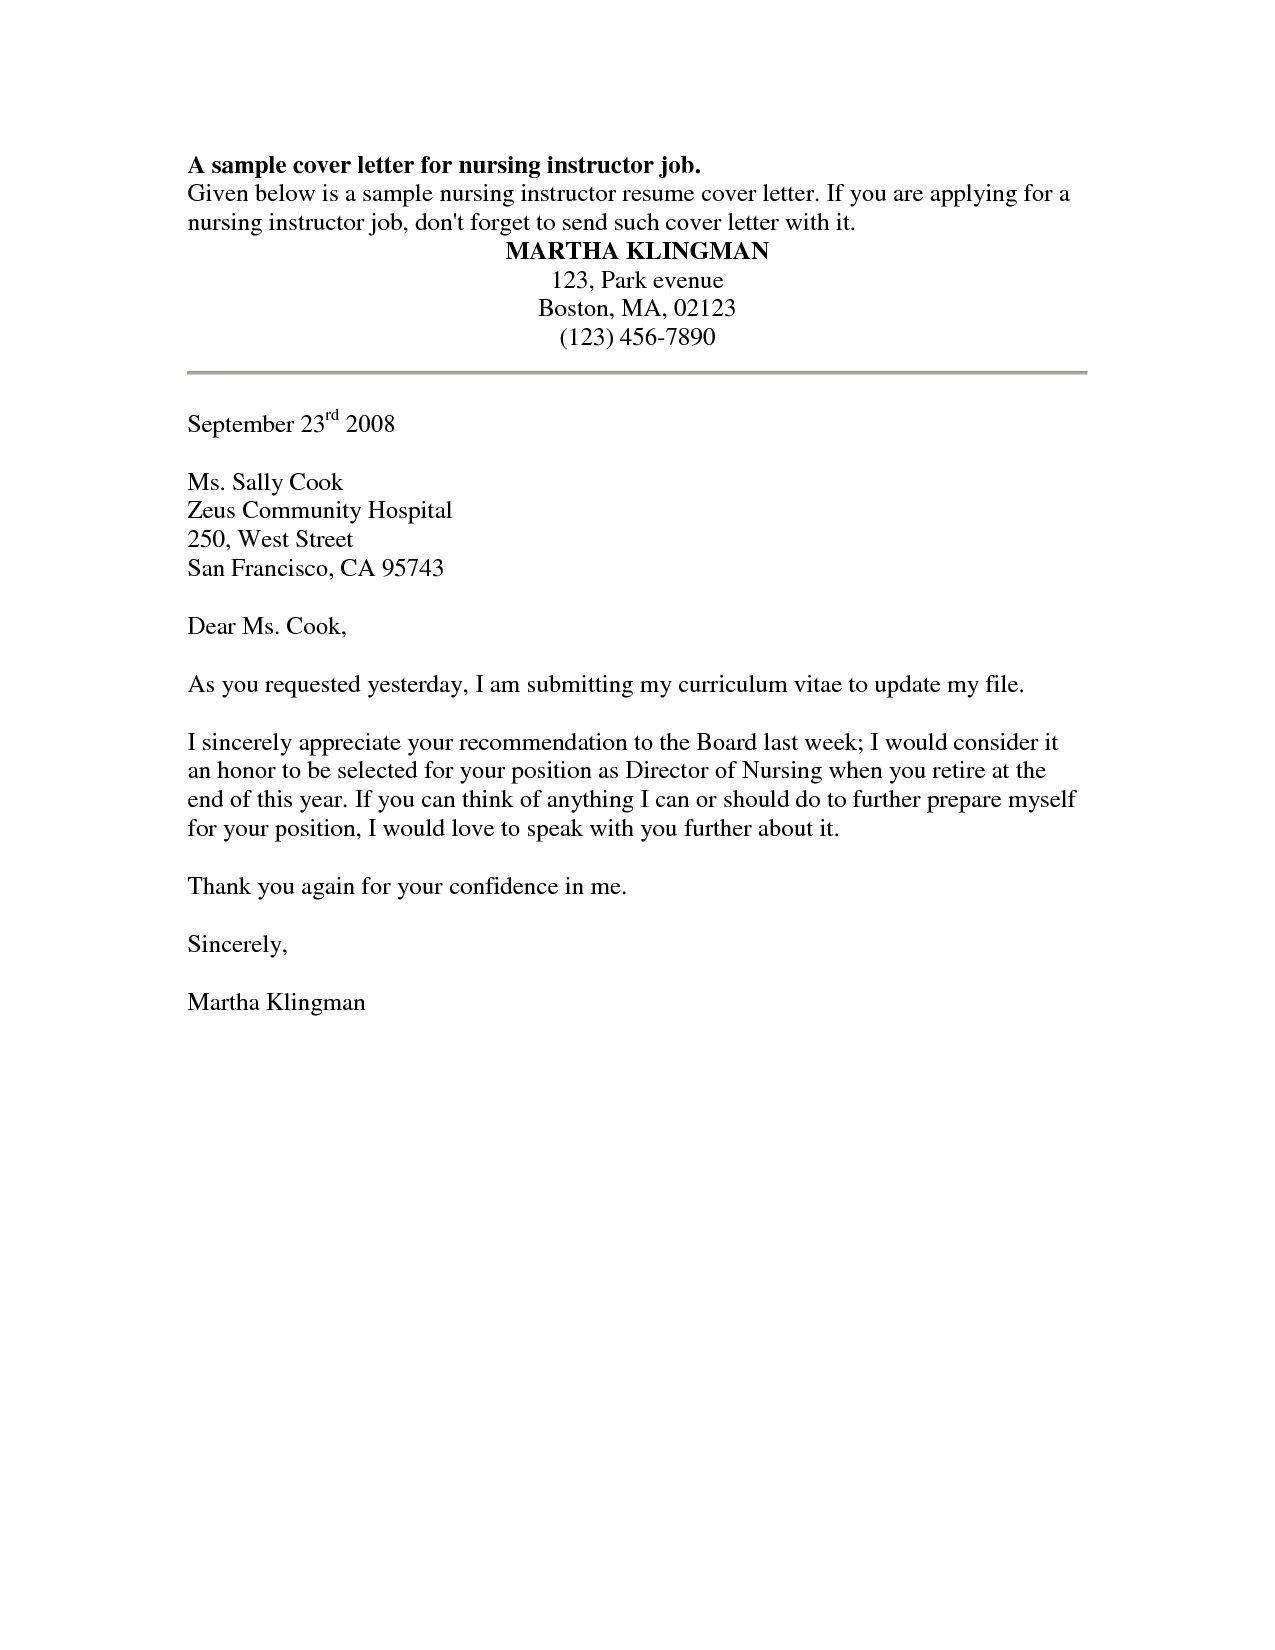 30 Simple Cover Letter Cover Letter Designs Resume Cover Letter